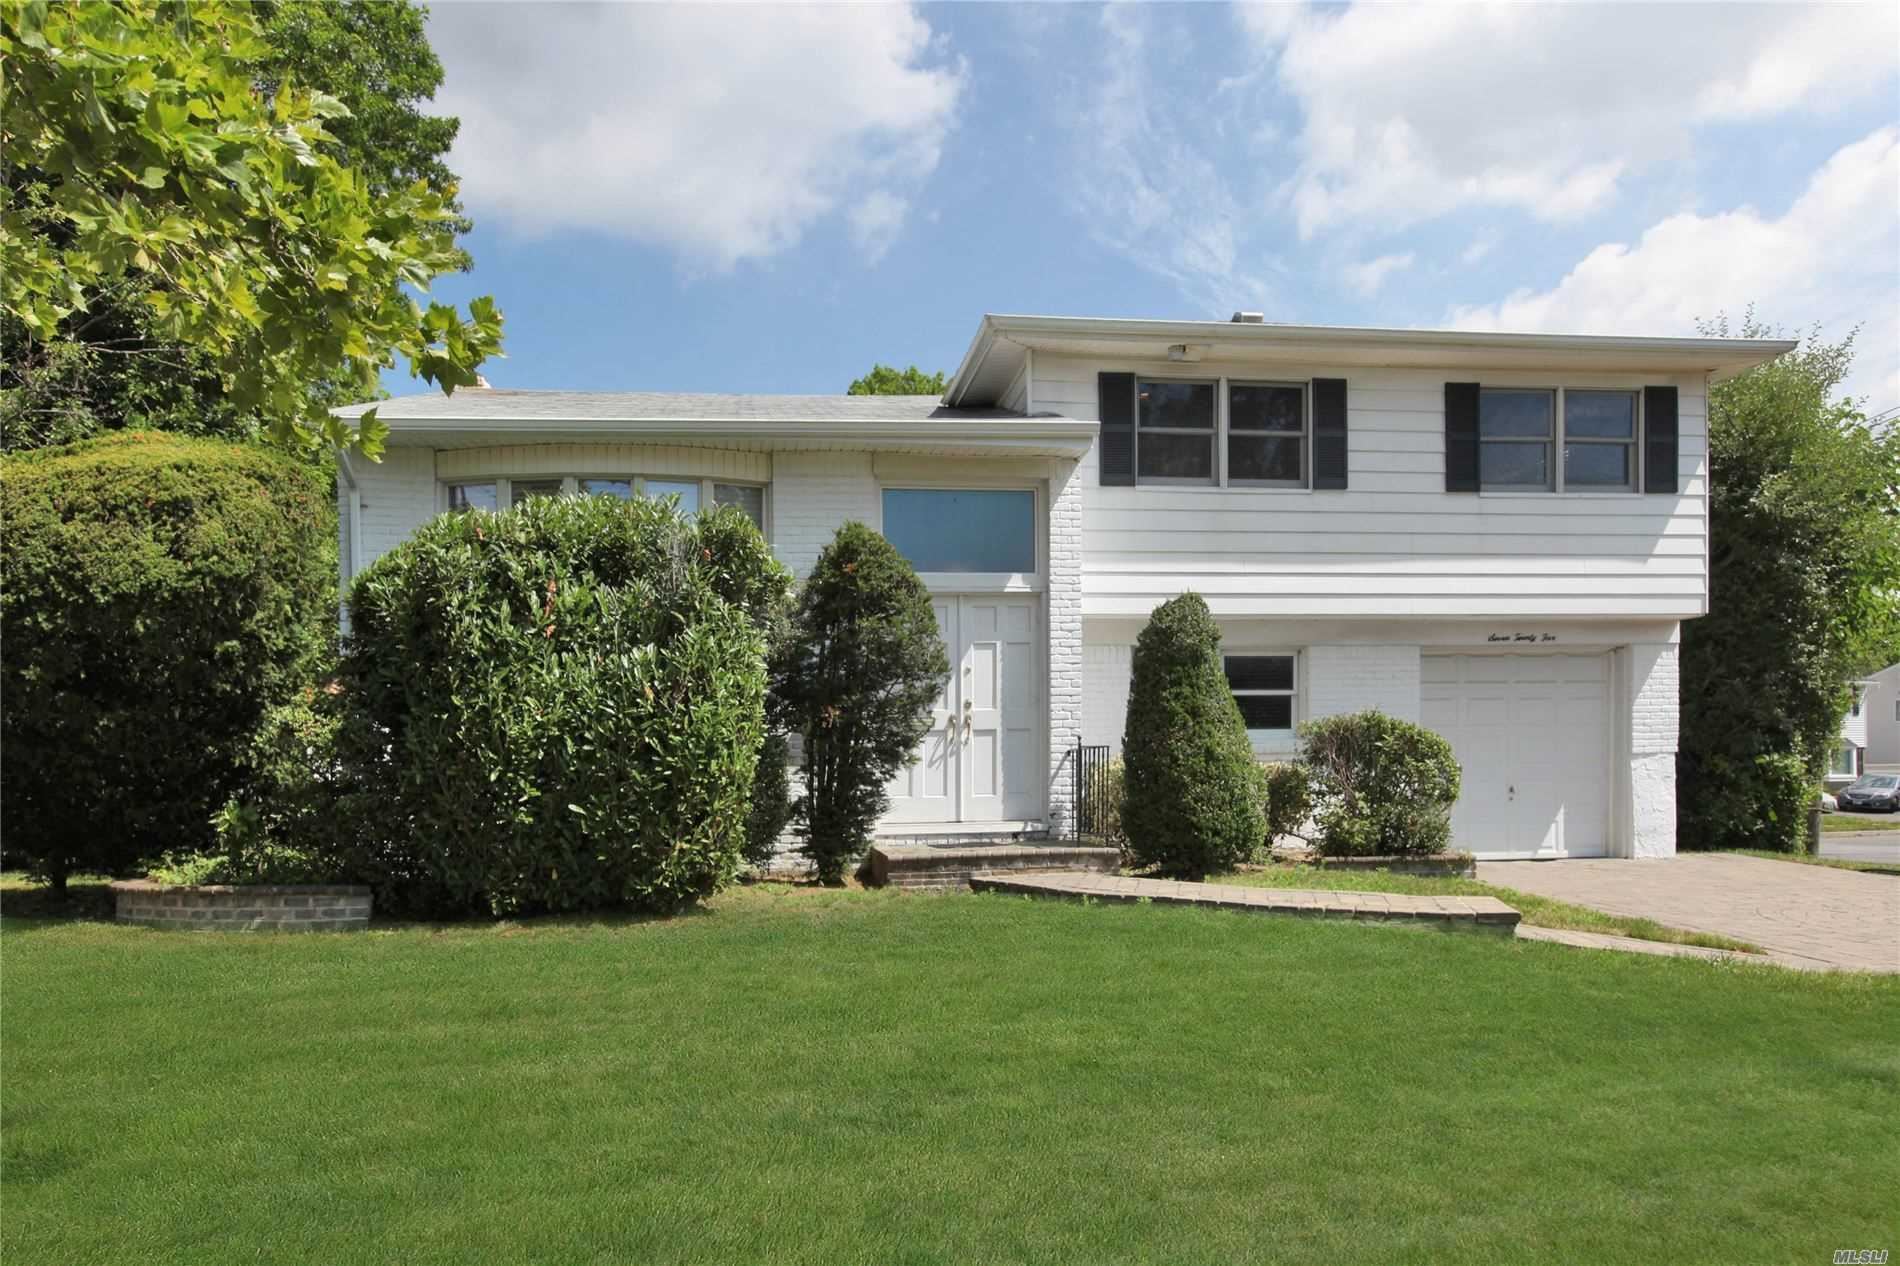 725 Jeffrey Drive, Baldwin Harbor, NY 11510 - MLS#: 3230211